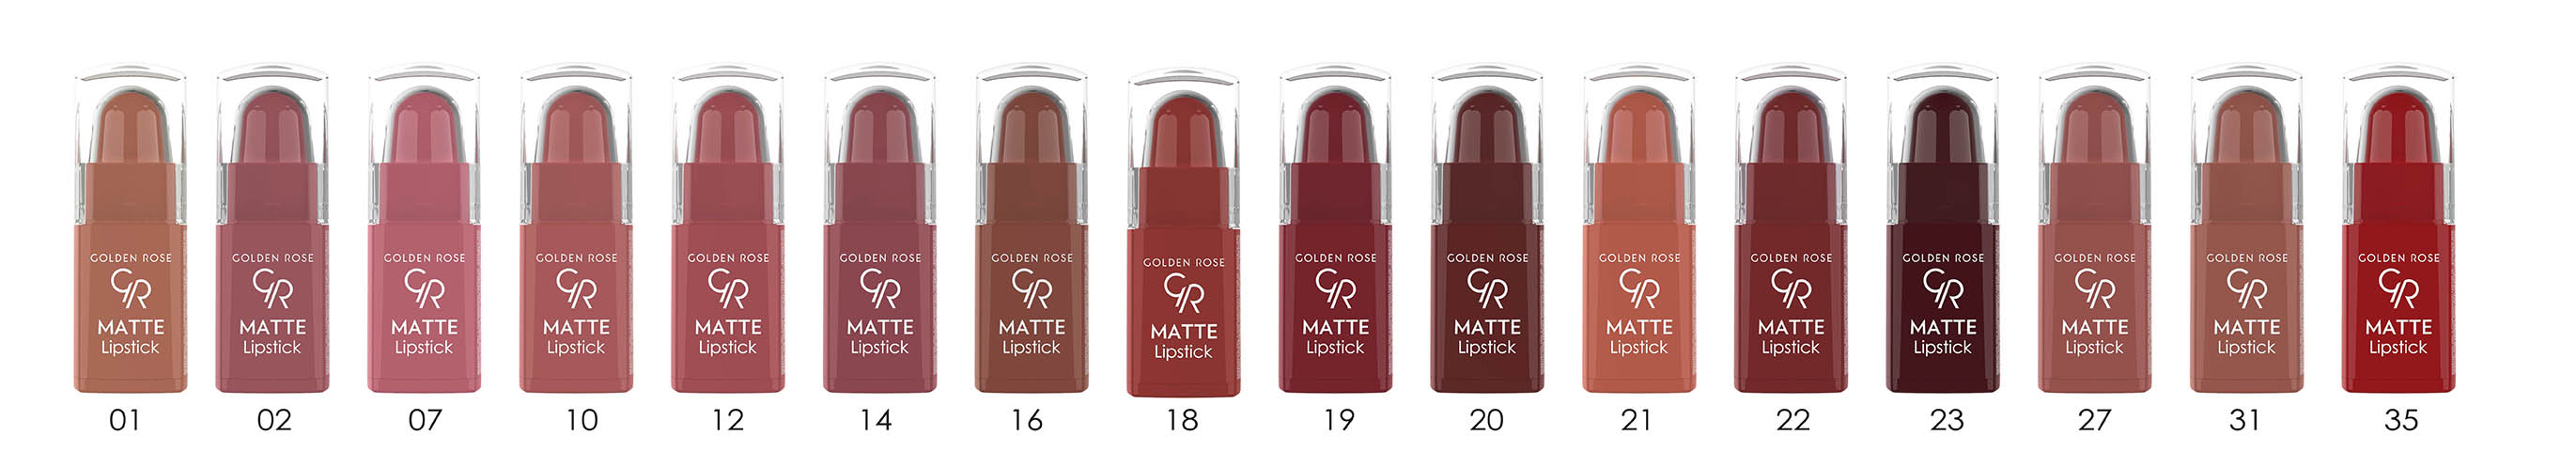 Matte lipstick -Hepsi.jpg (140 KB)